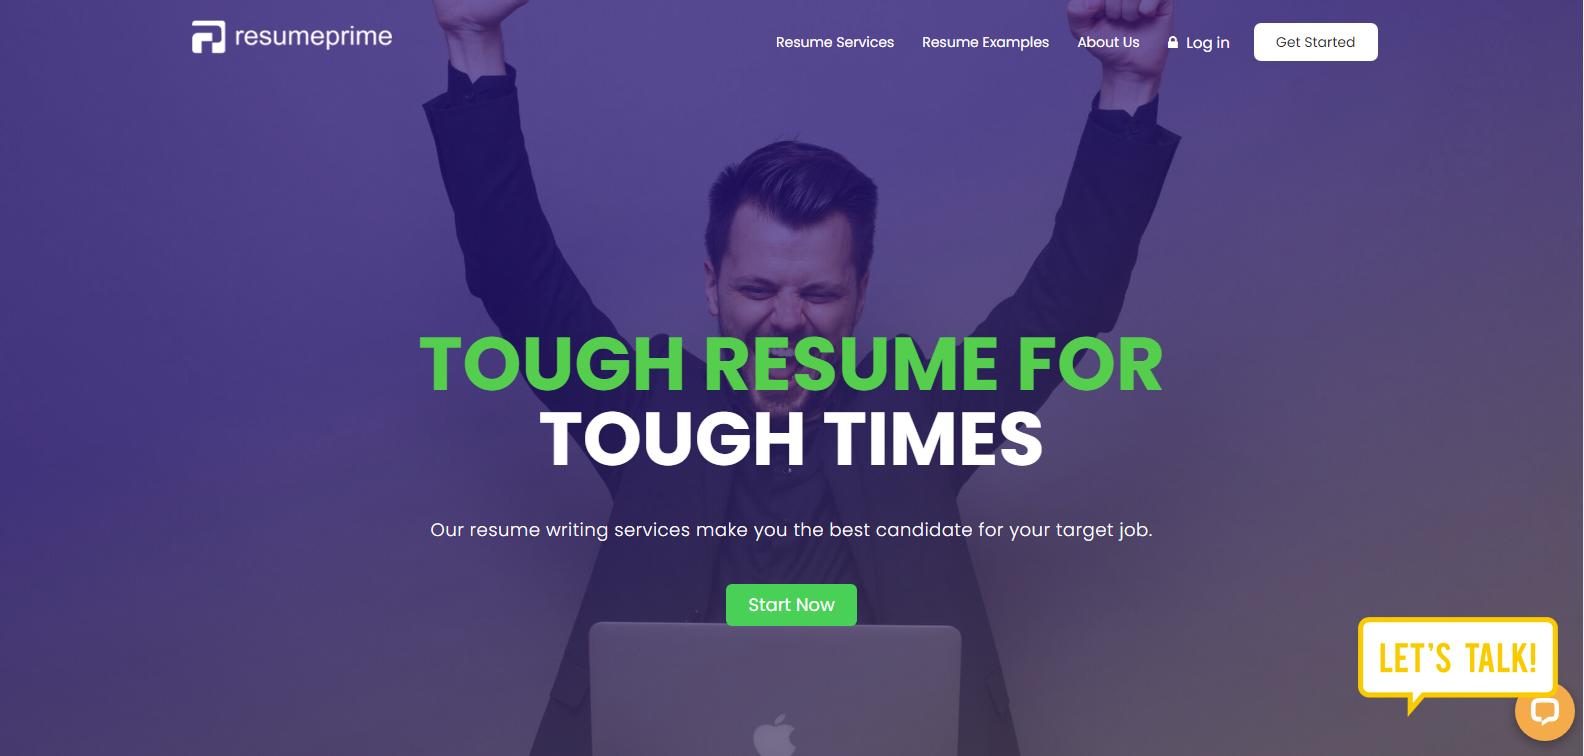 Best Sales Resume Services - Screenshot of Resume Prime Homepage